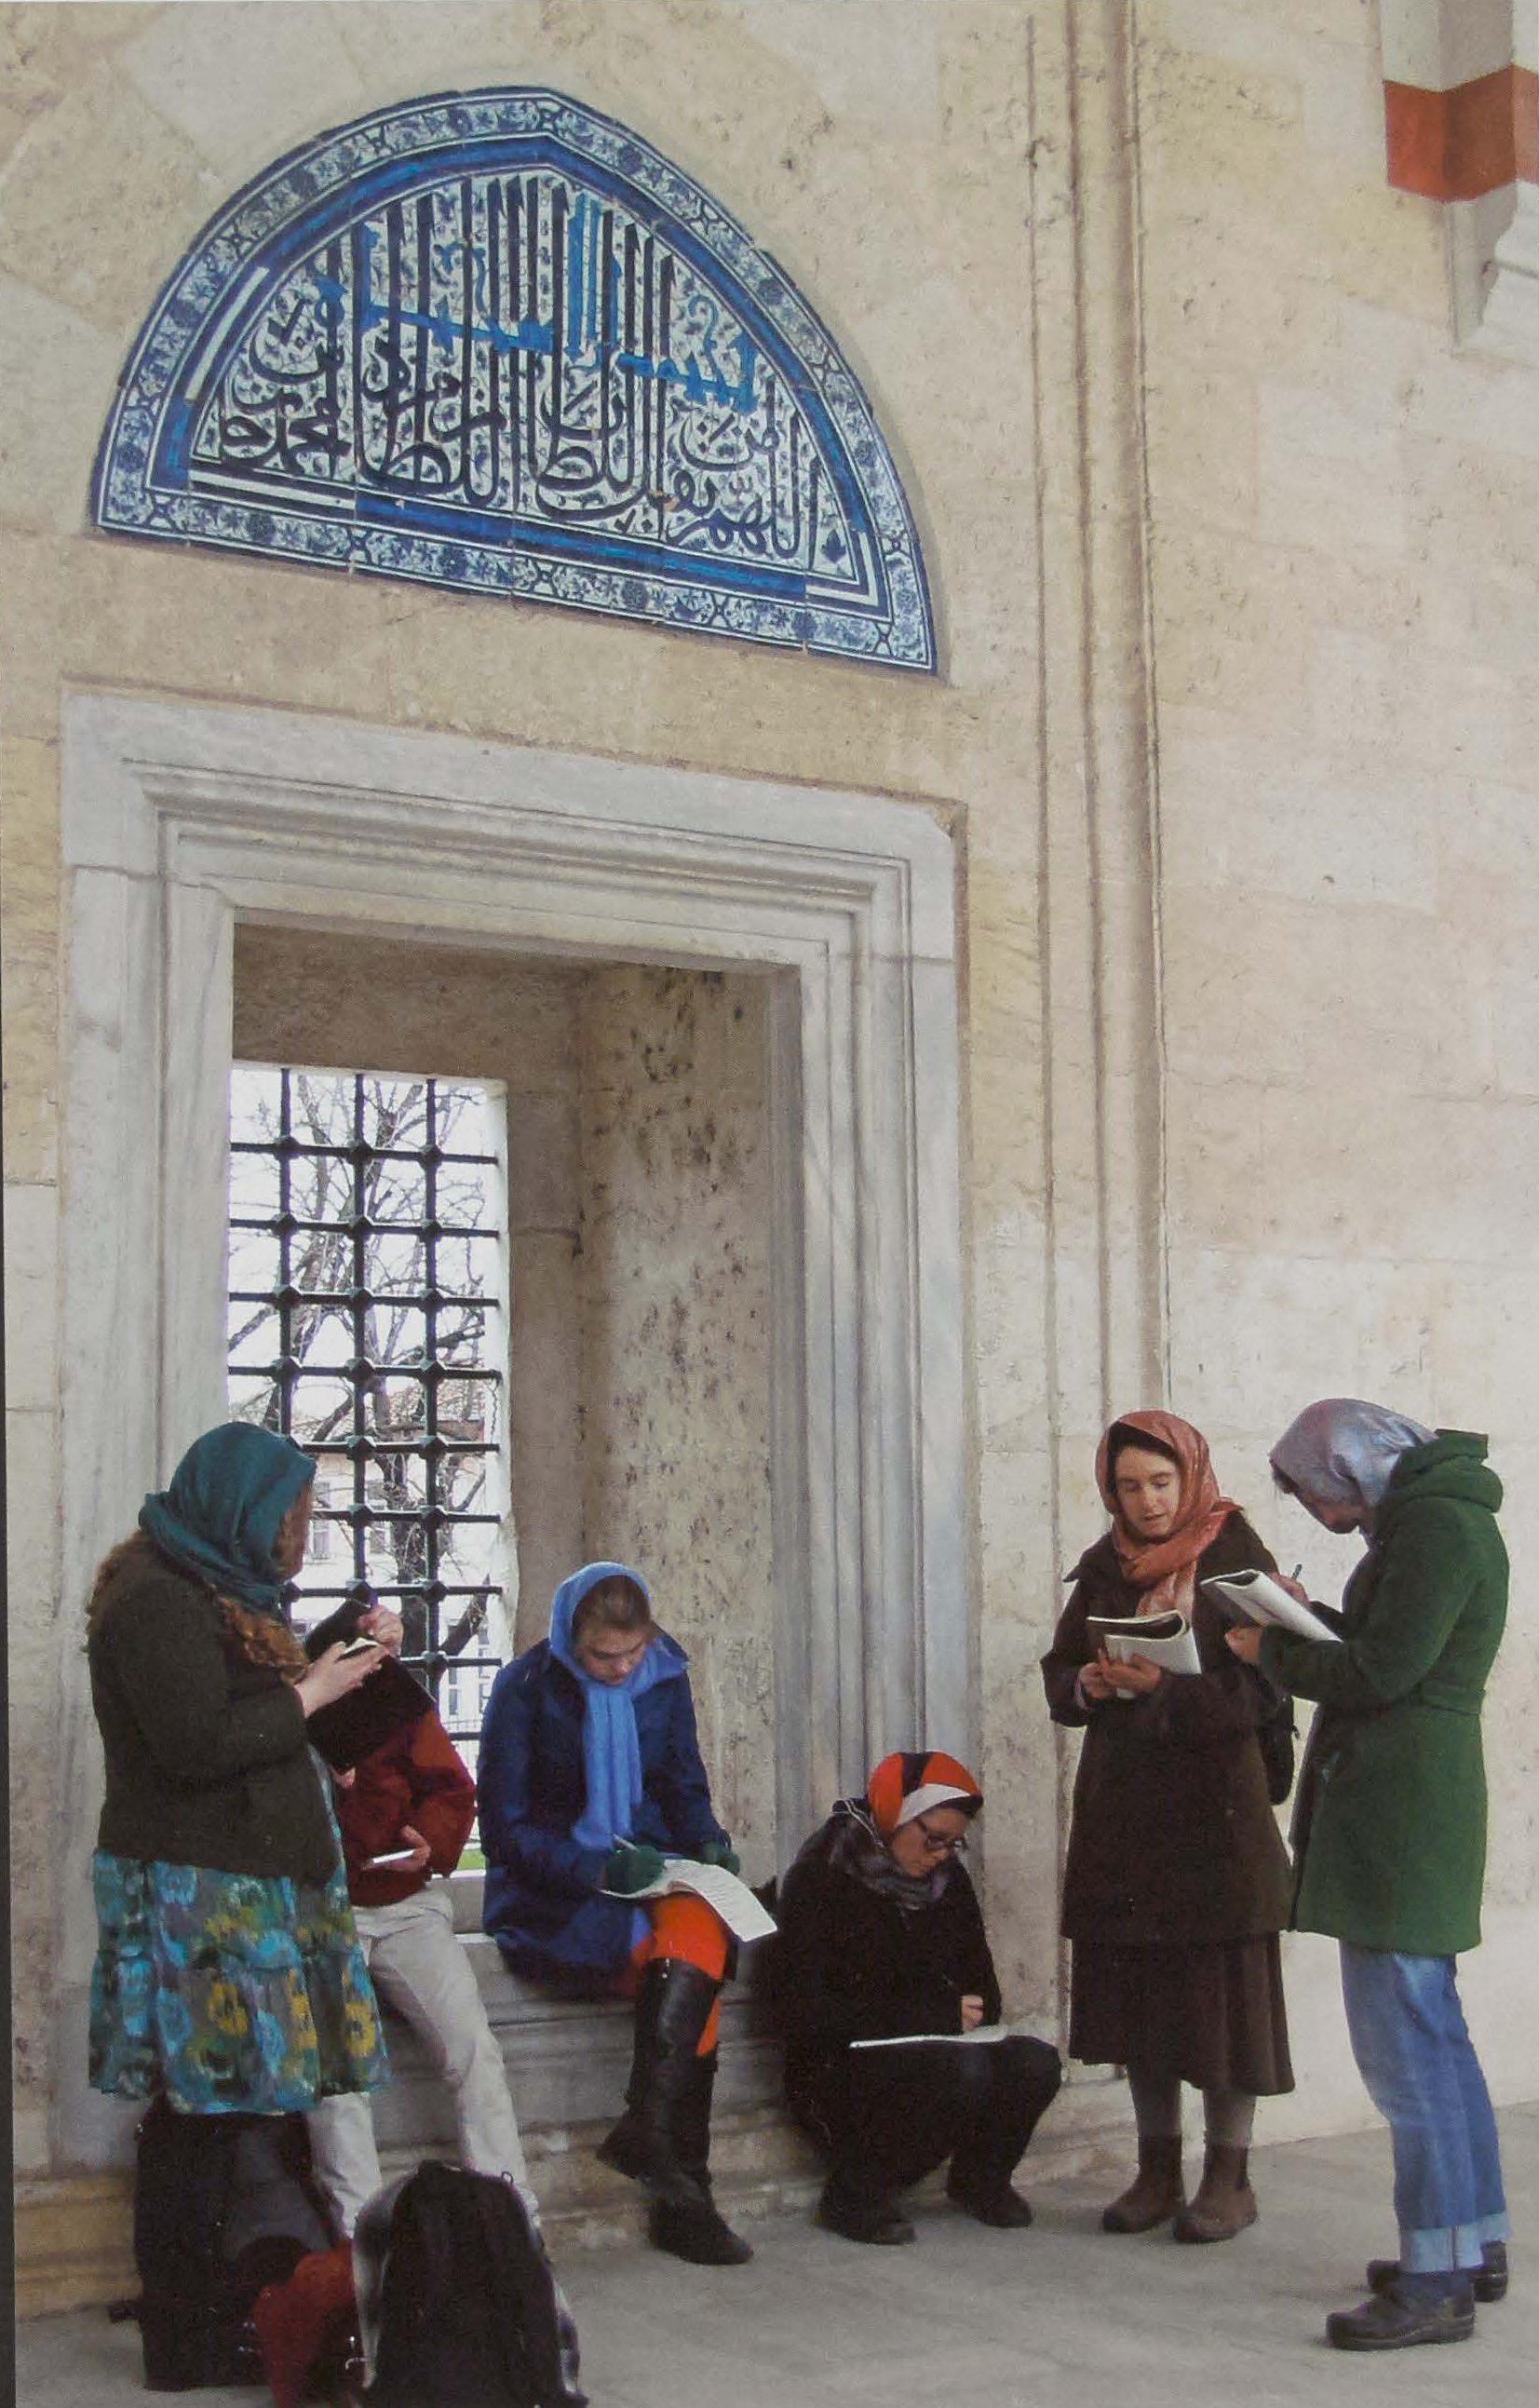 Marlboro College students at Uc Serefeli Mosque, Edime, Turkey, 2013.